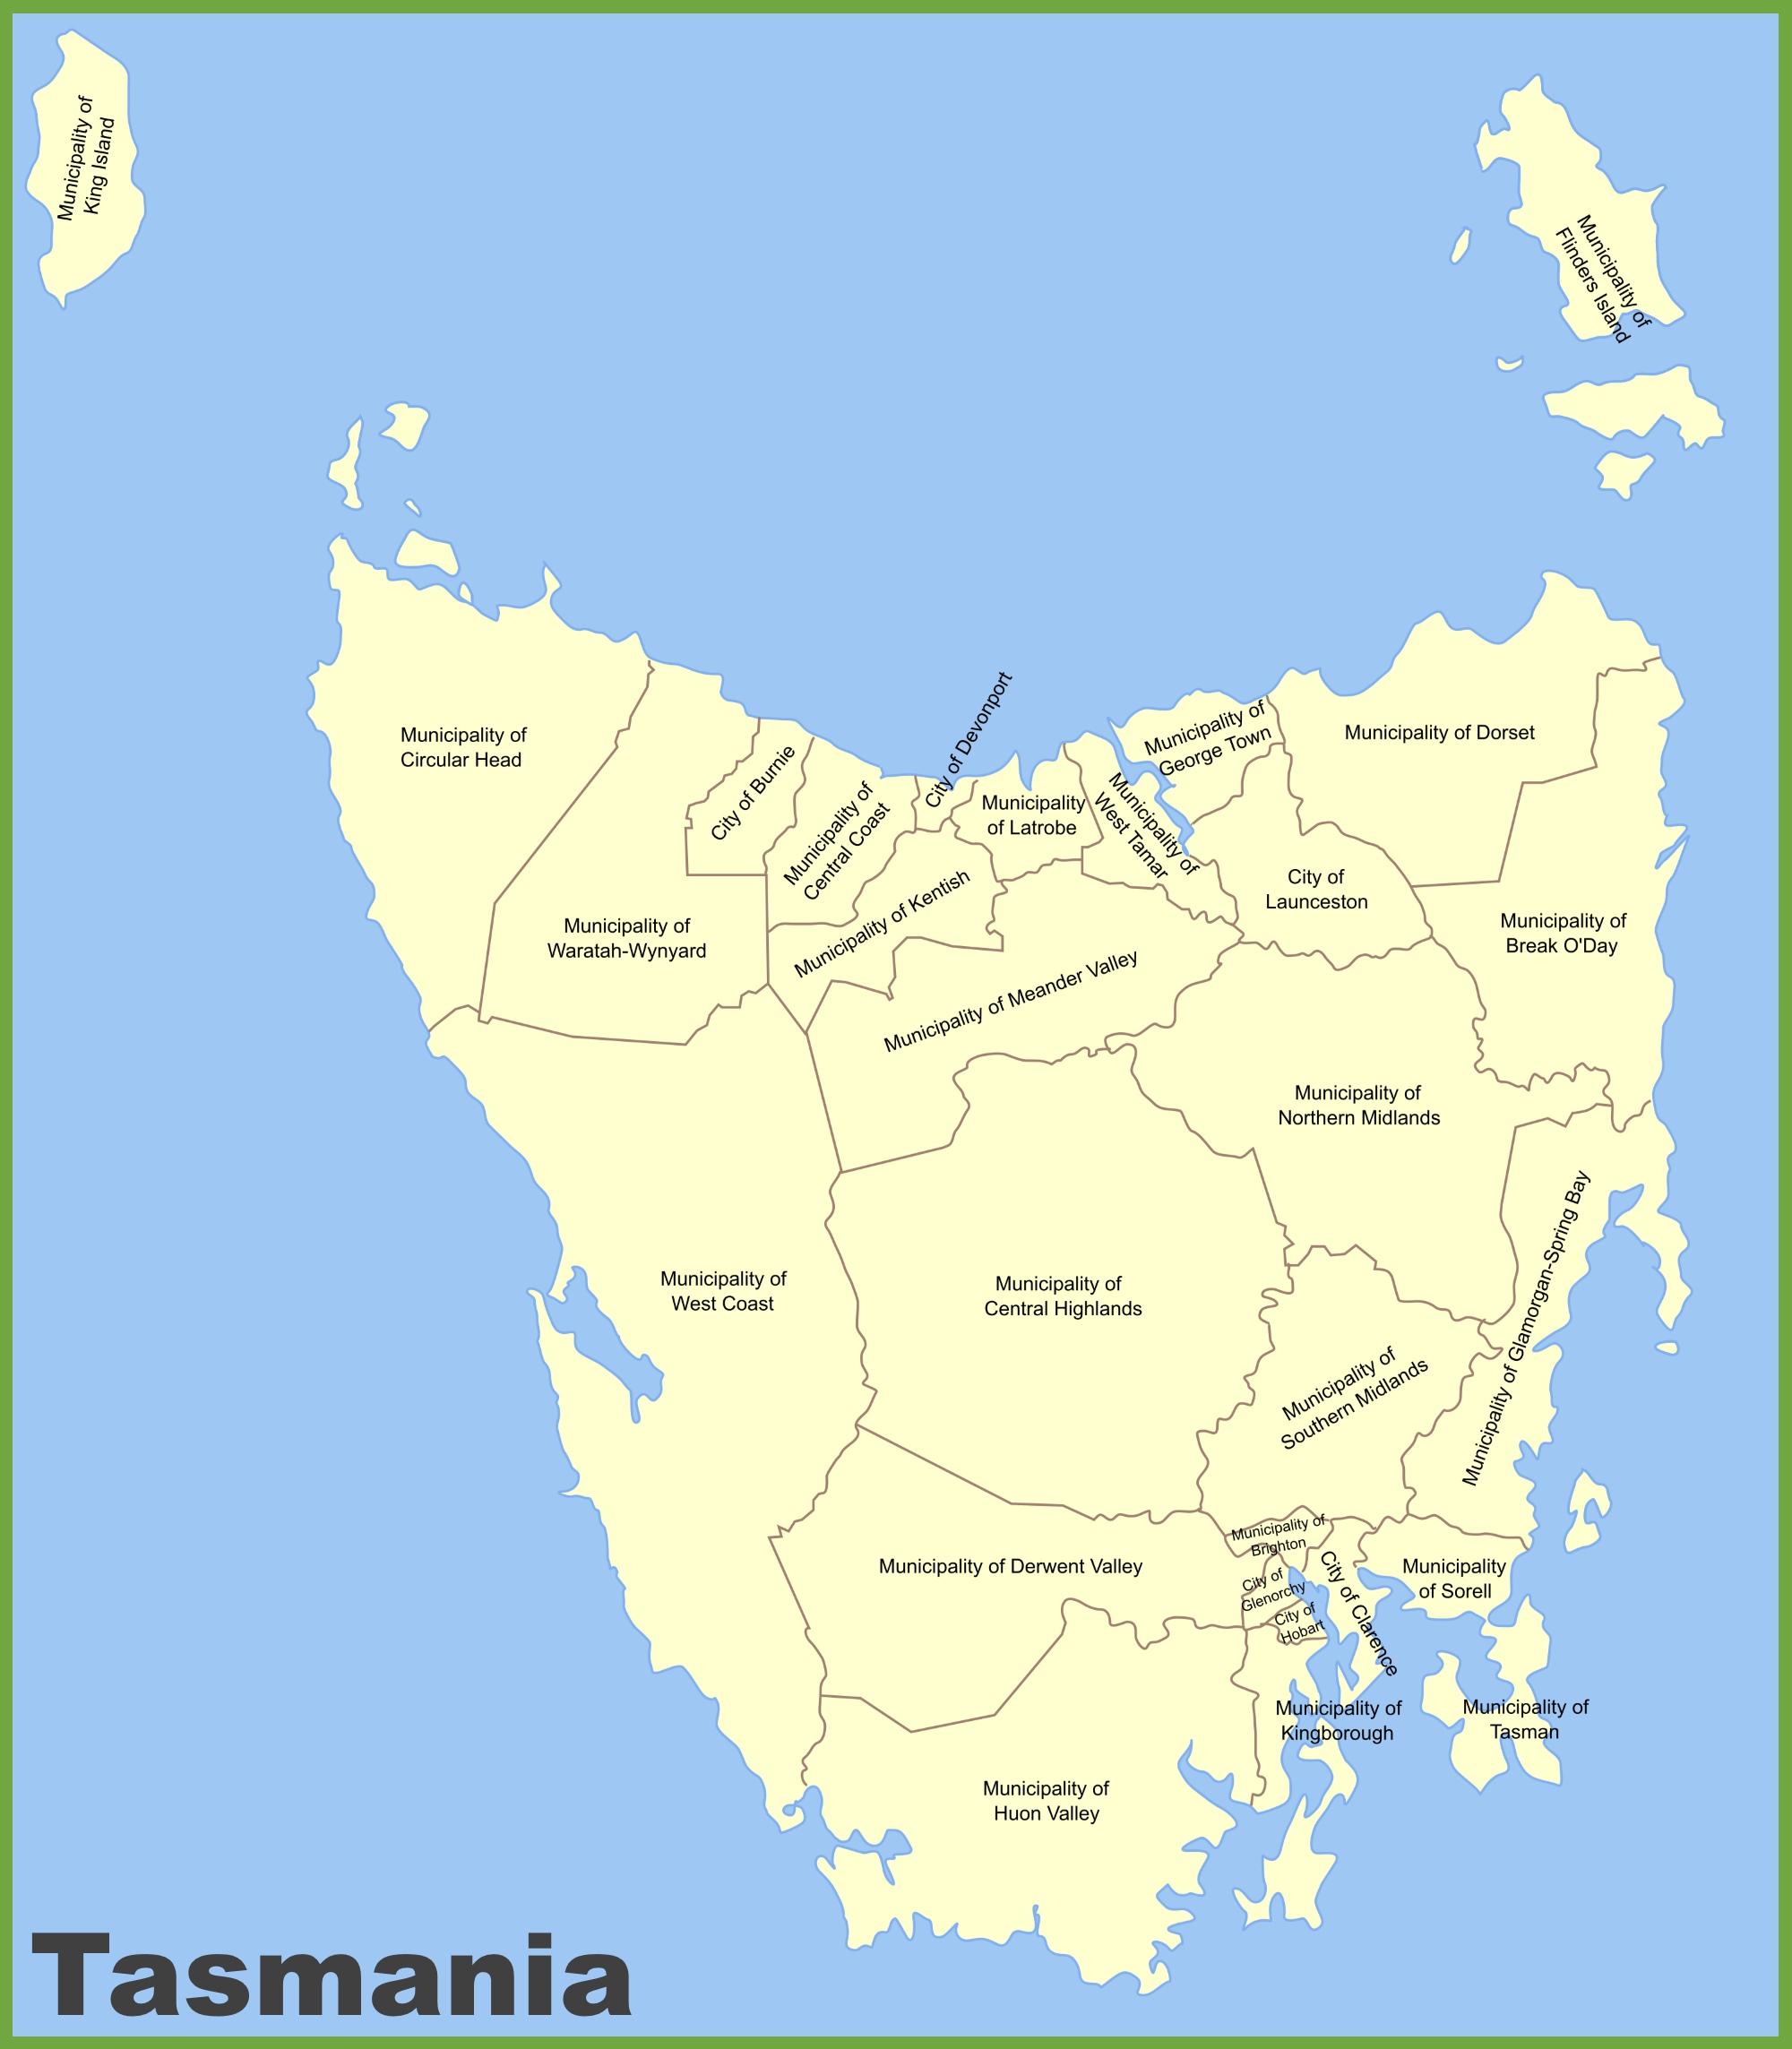 Local government areas of Tasmania